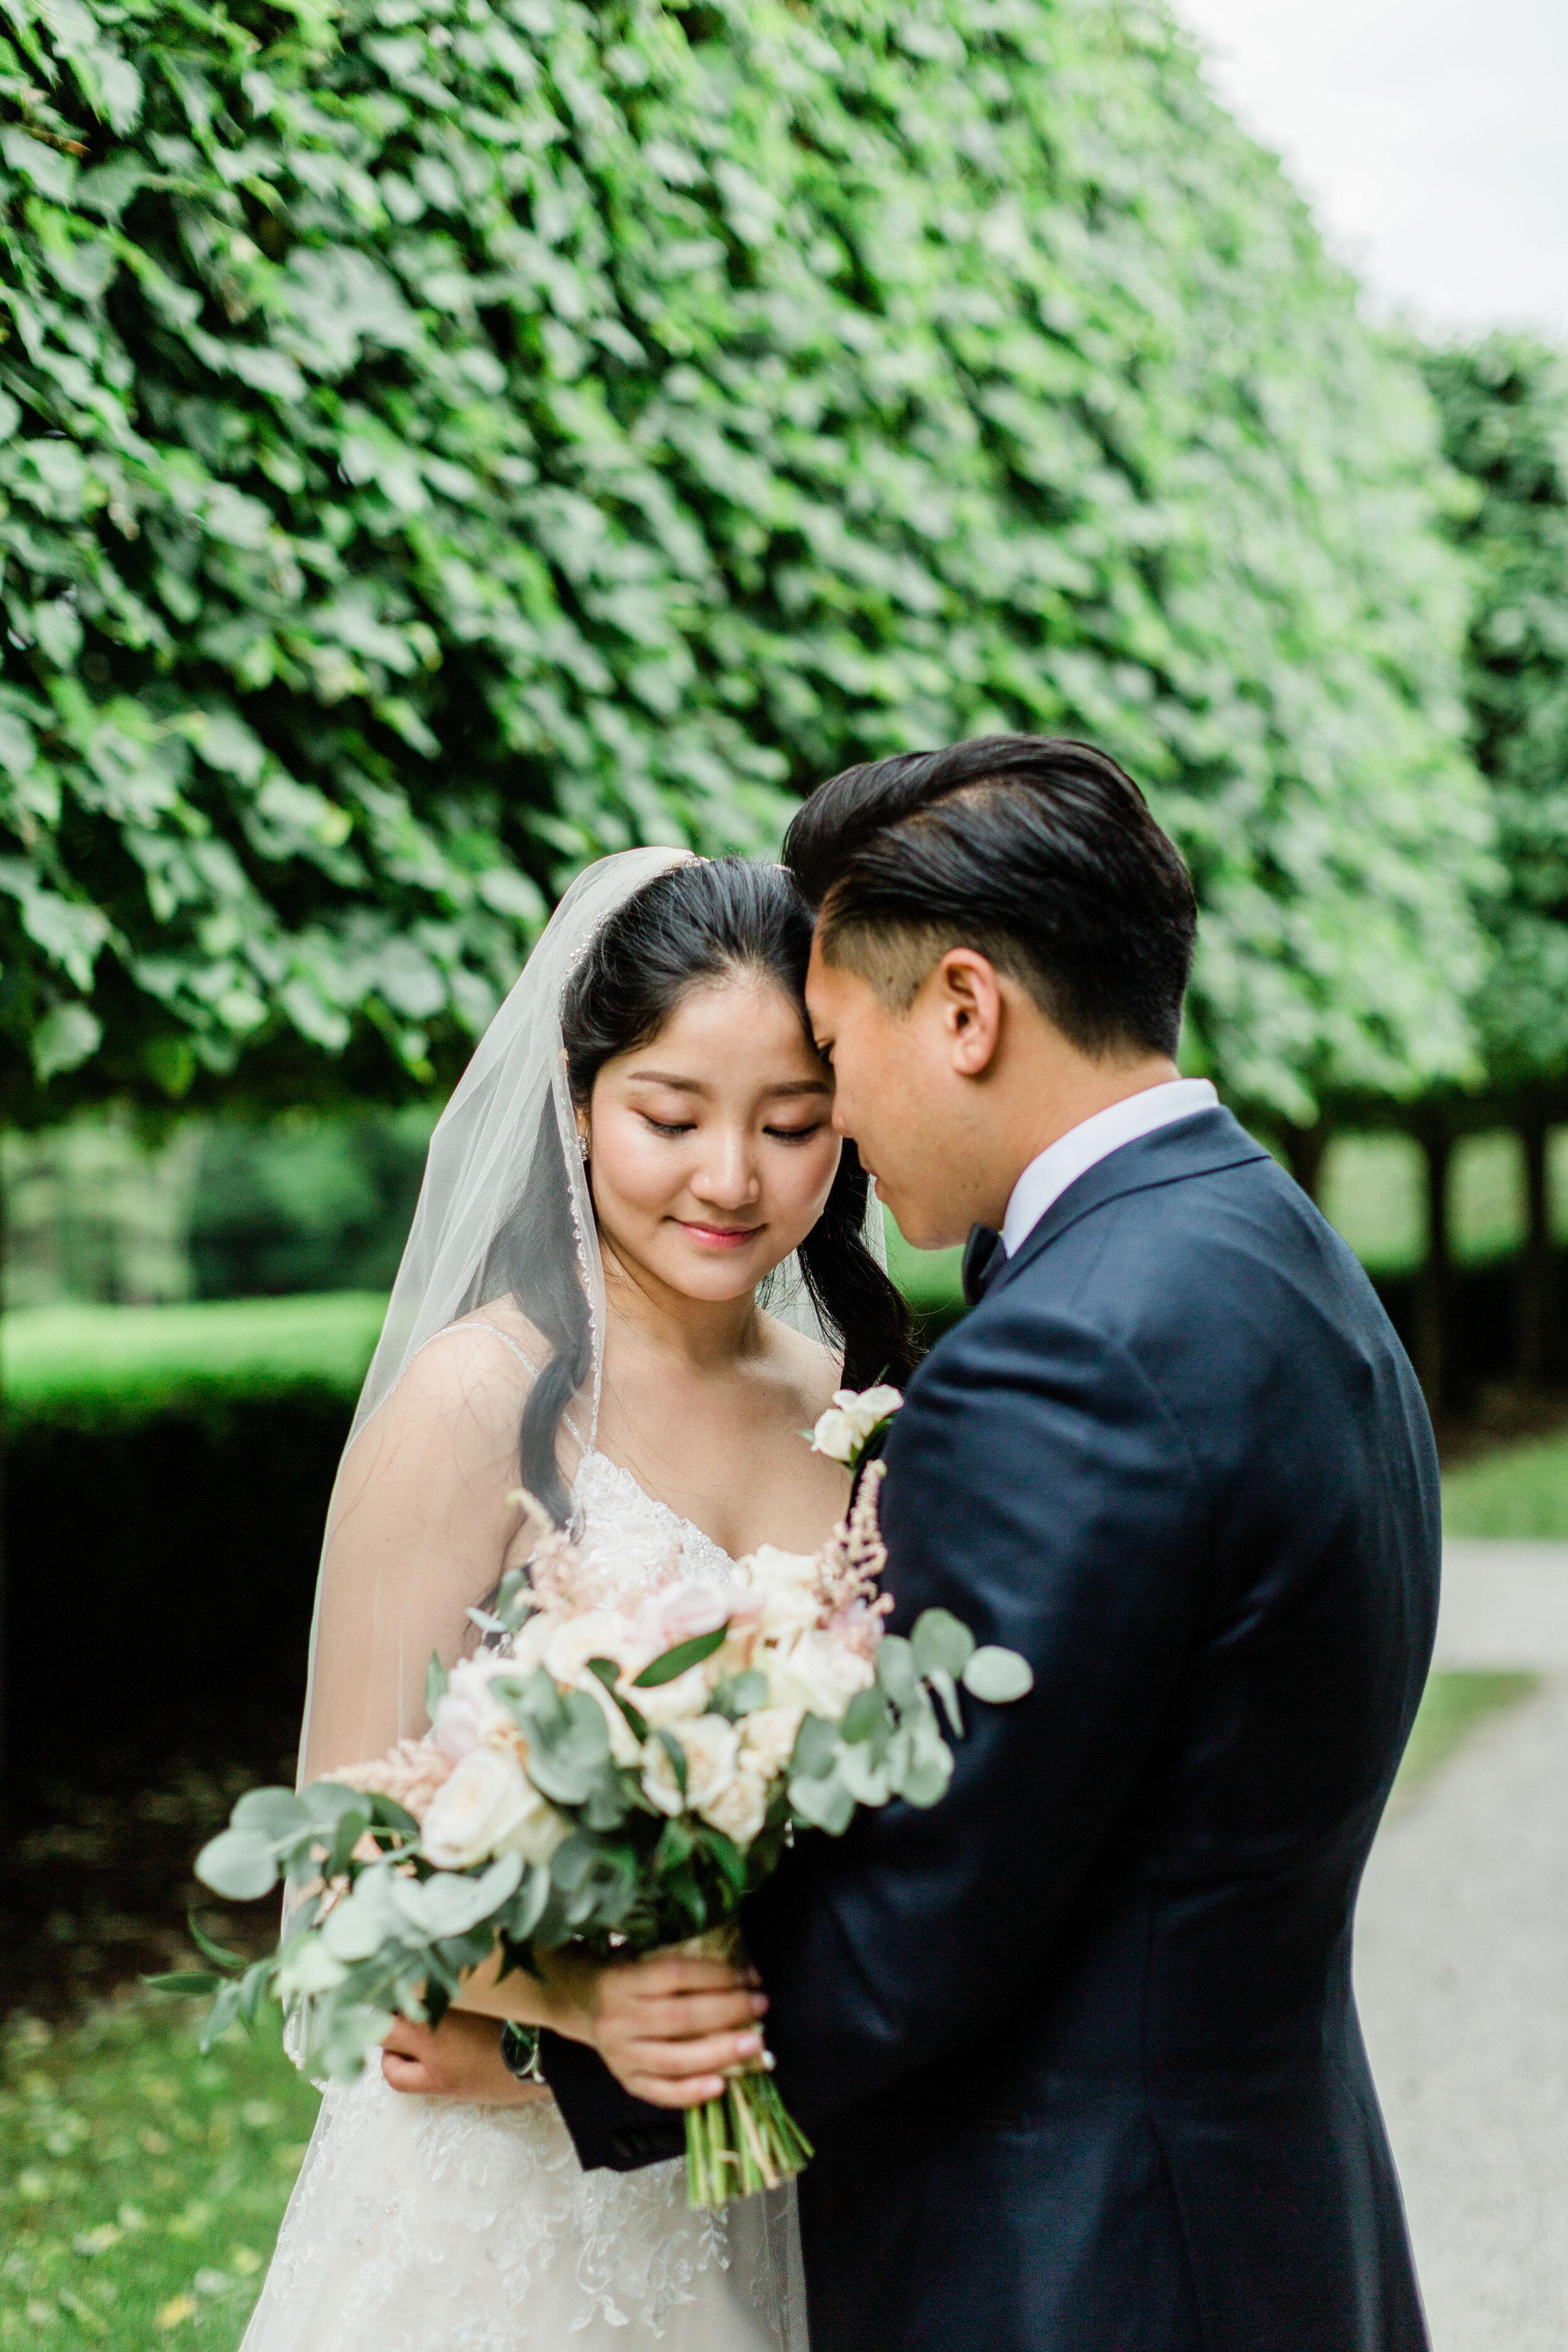 Estate Weddings in New England